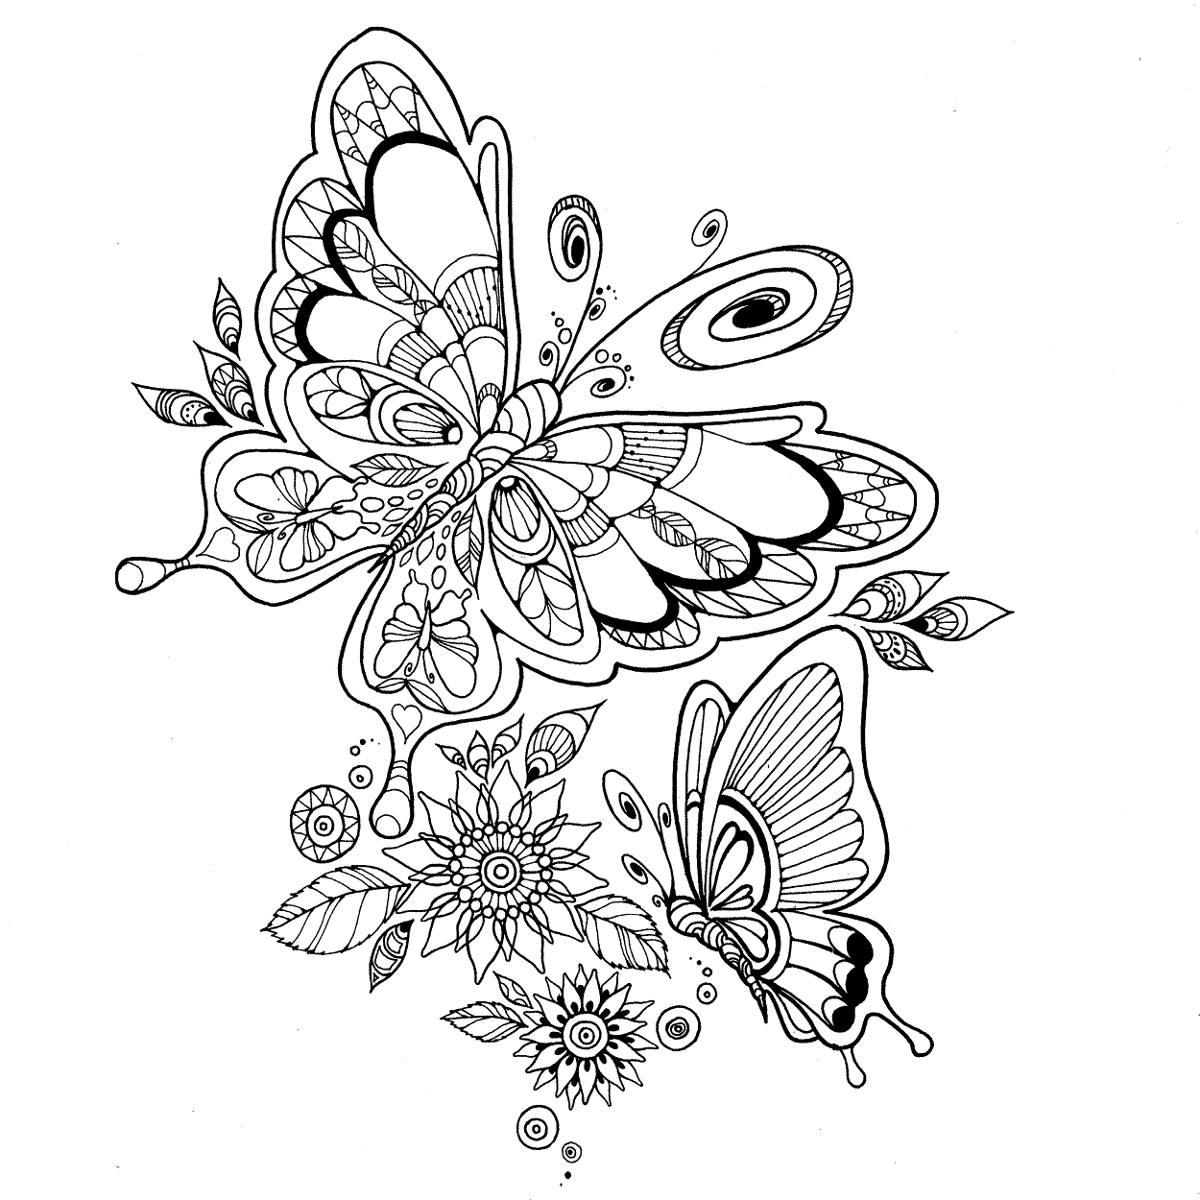 Mandalas: Dibujos Para Colorear - $ 3.000 en Mercado Libre